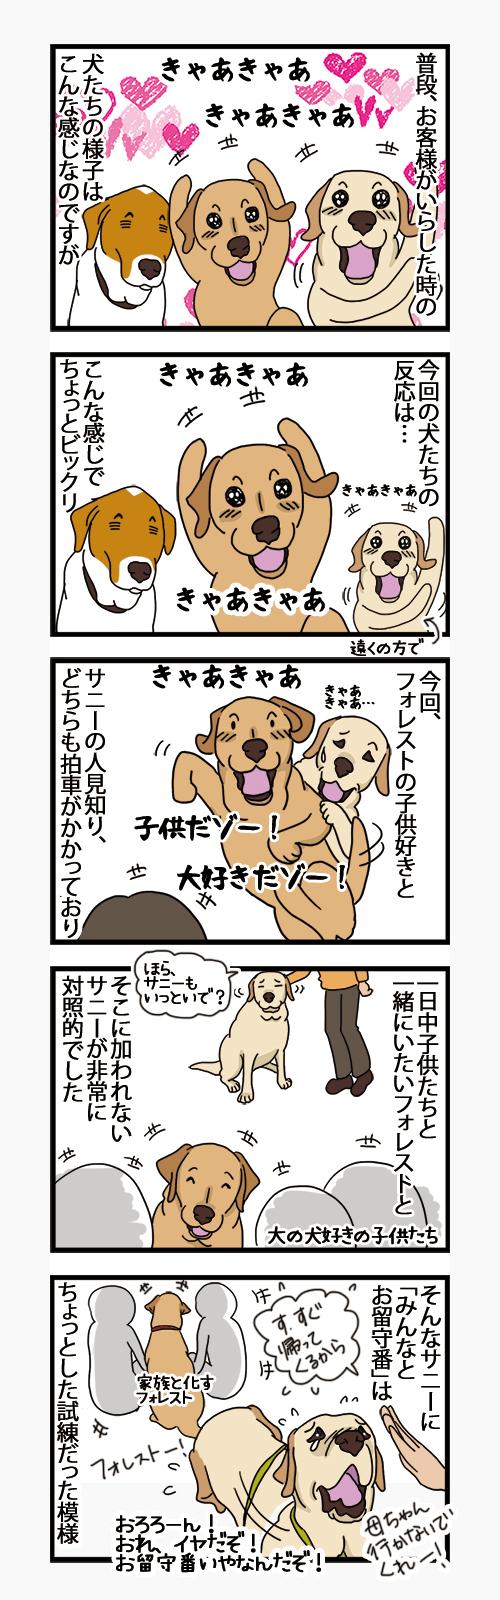 04012021_dogcomic.jpg